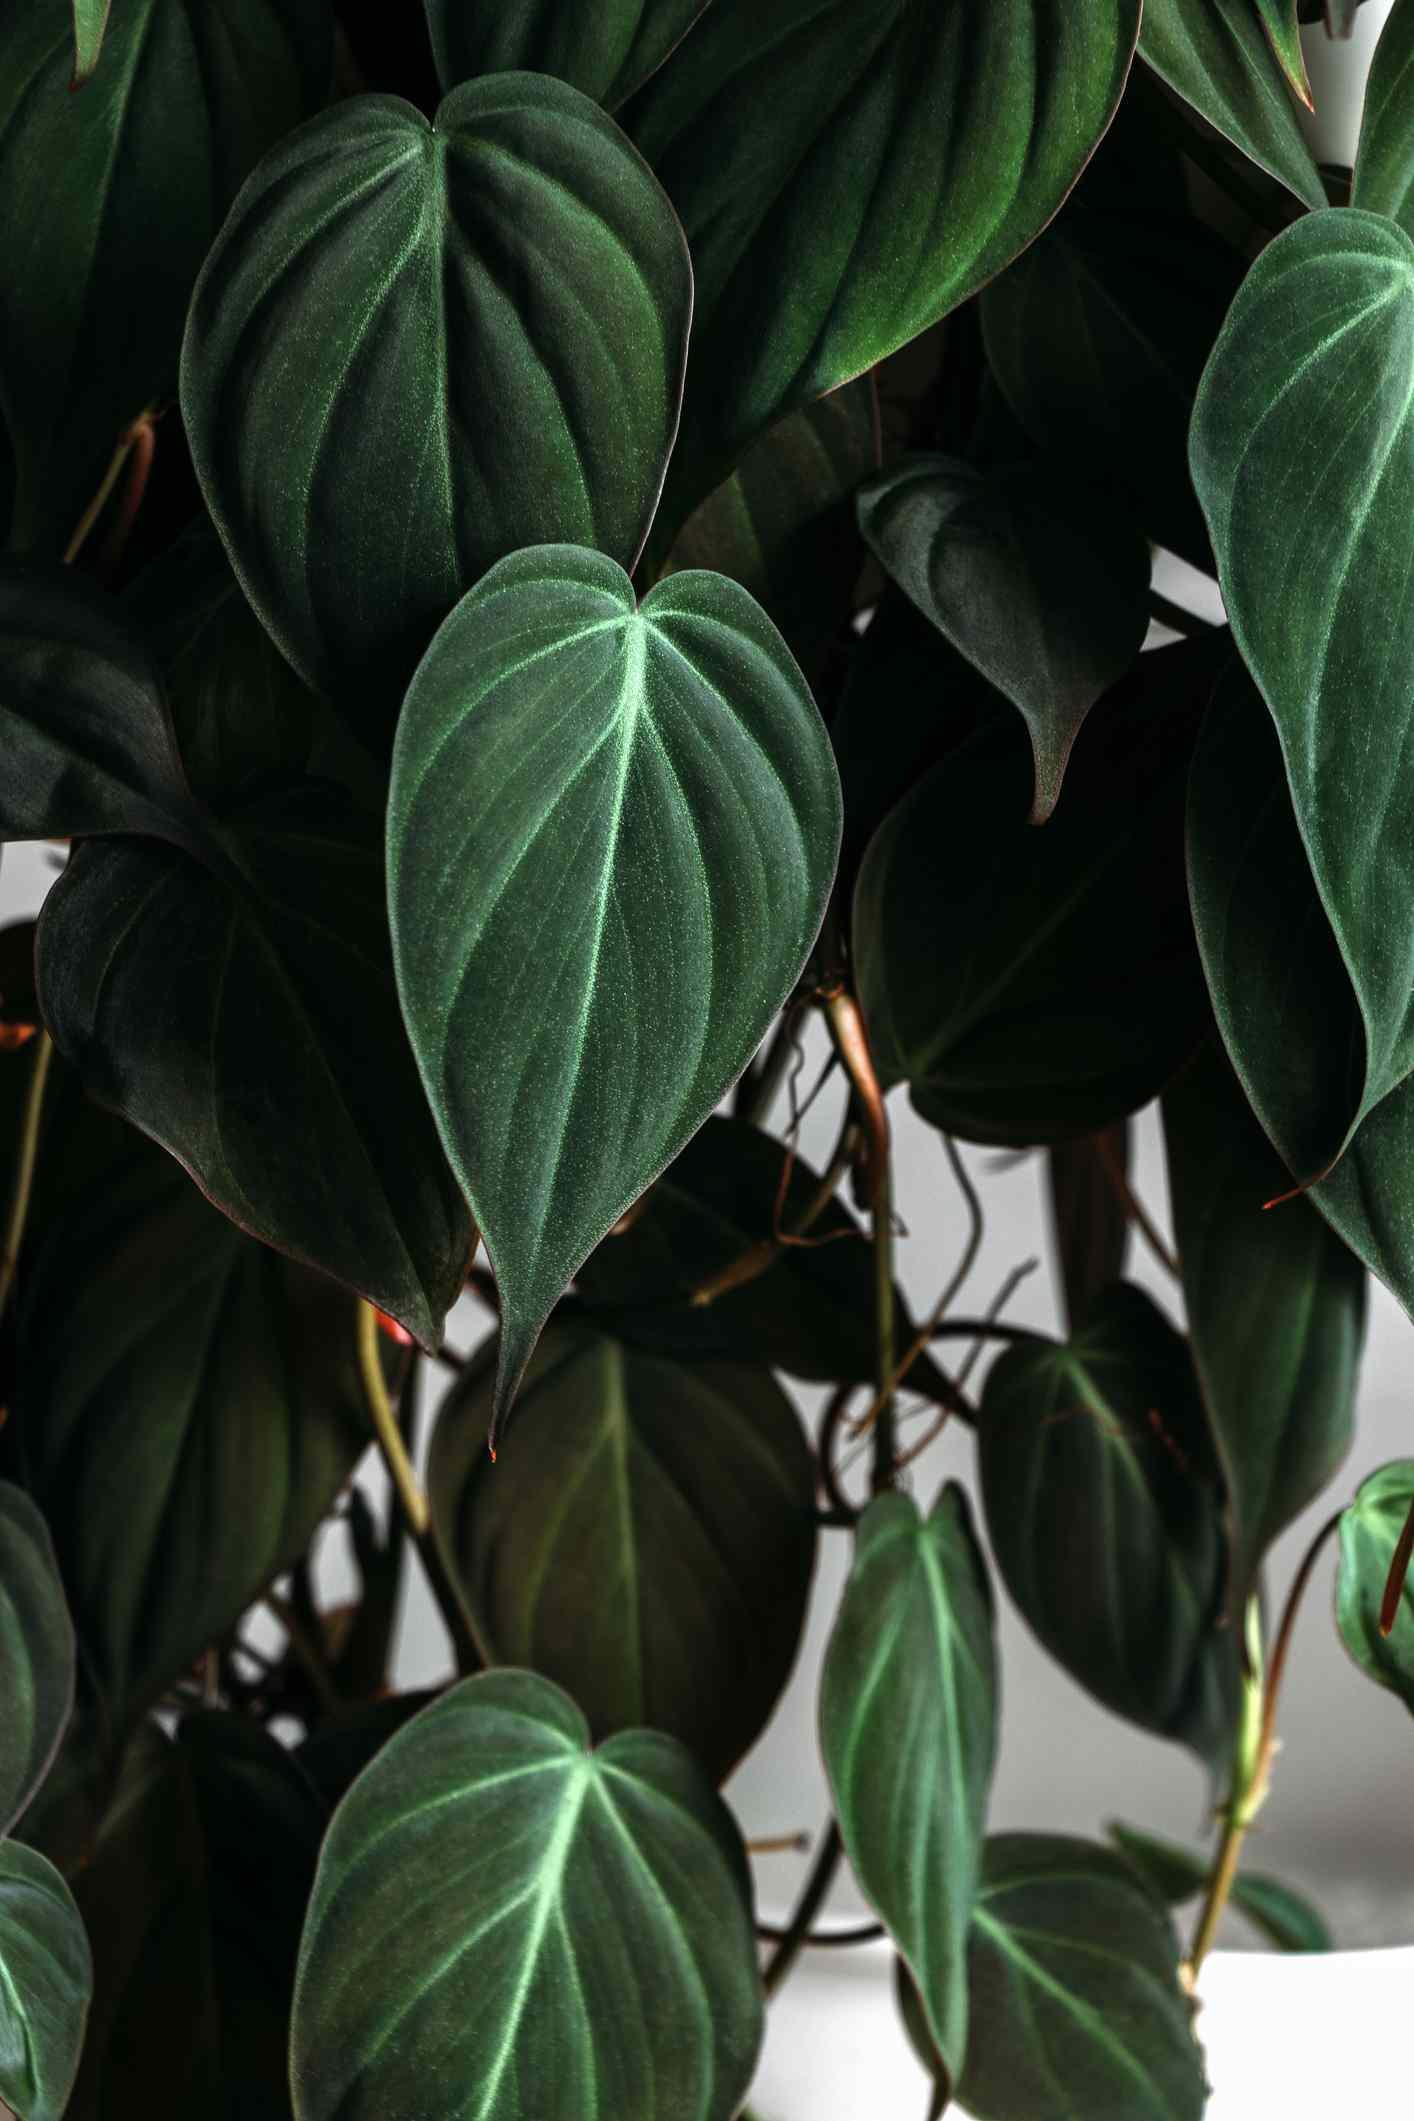 velvet leaf philodendron closeup